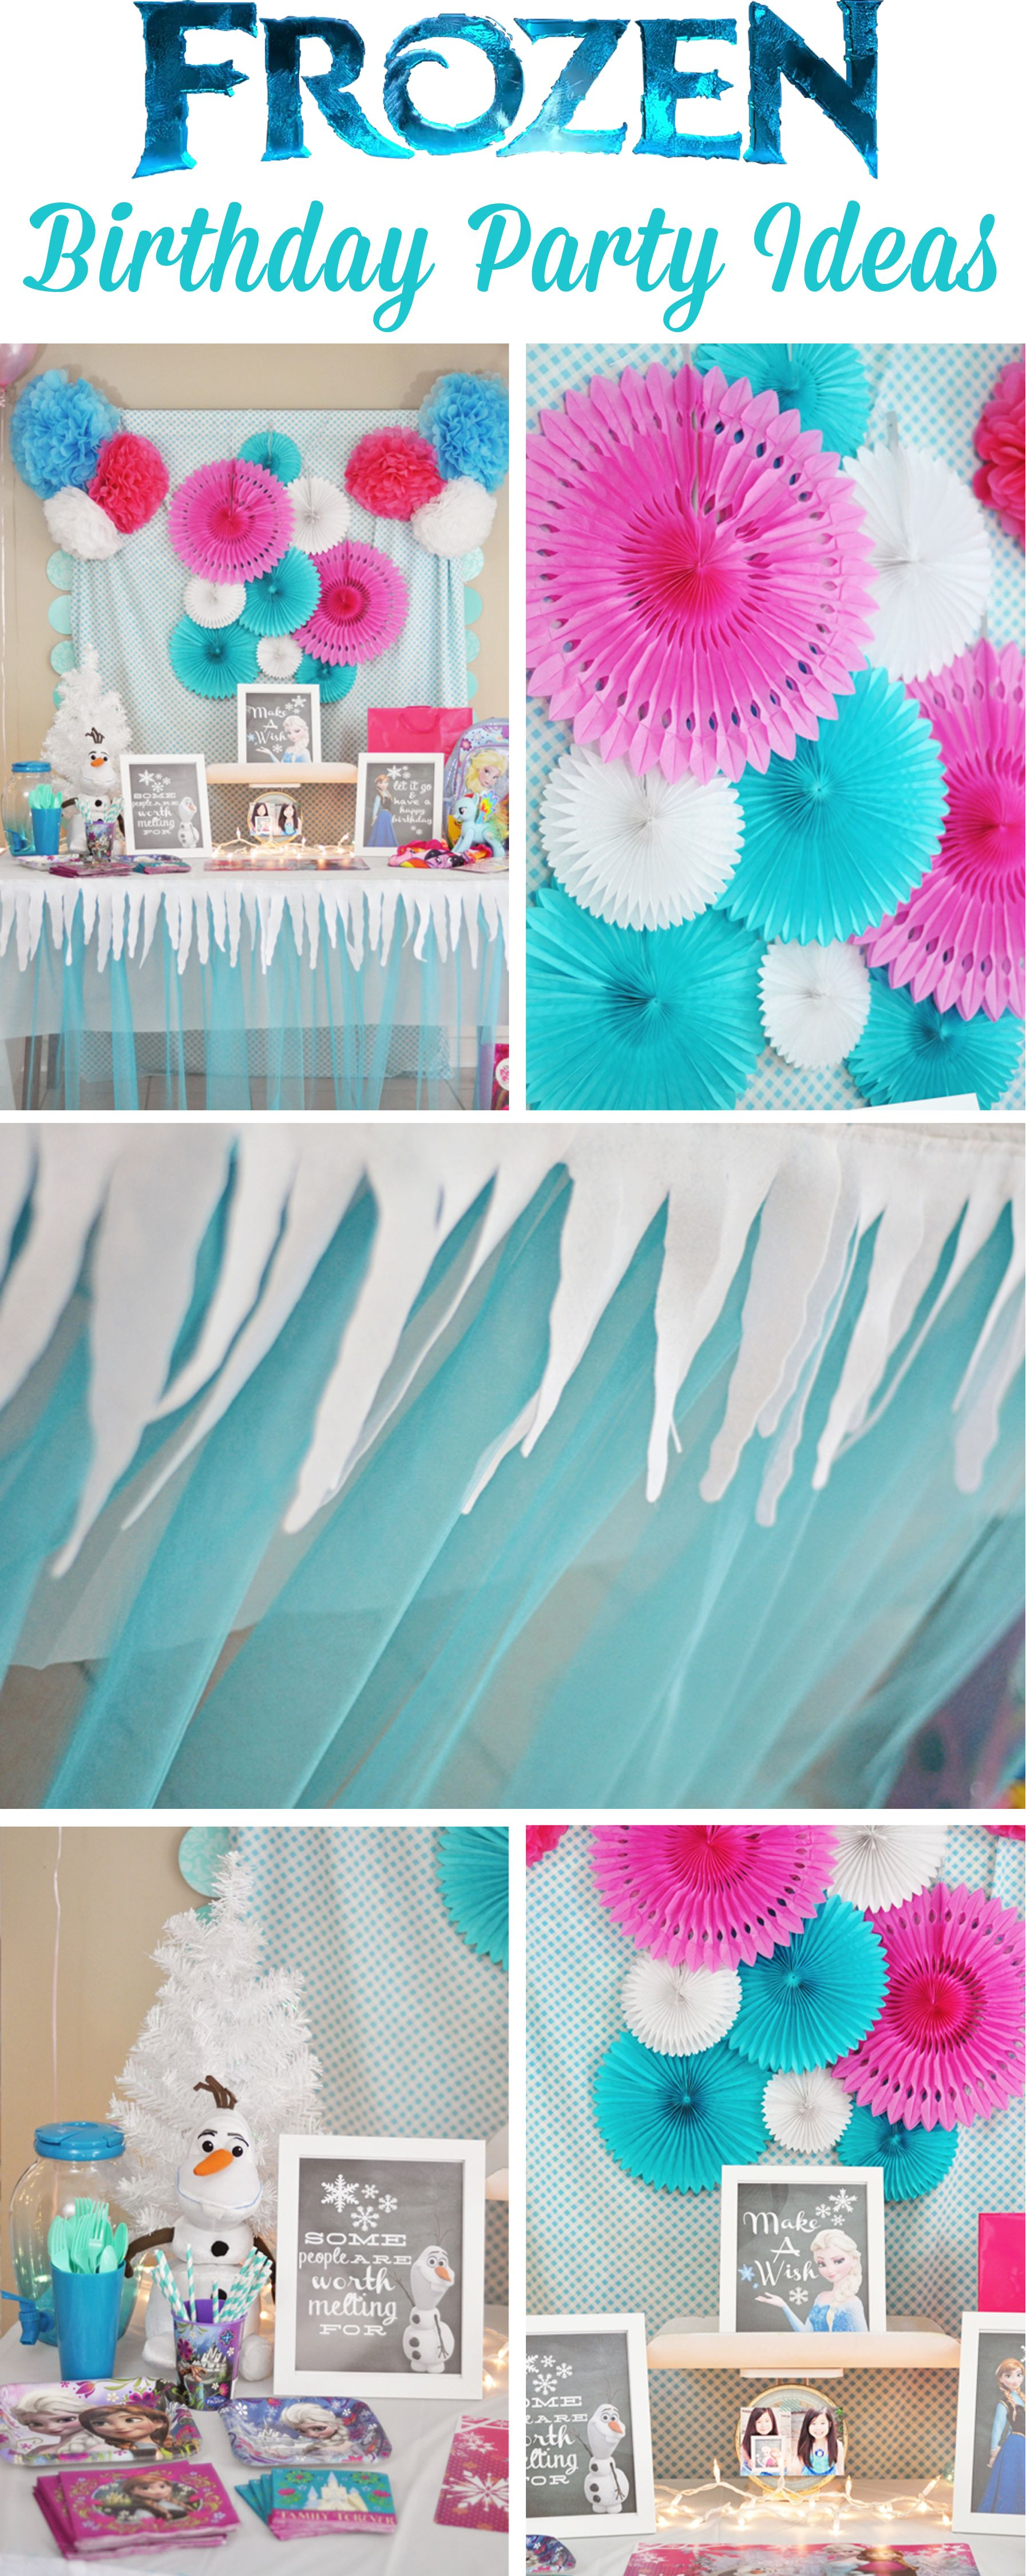 Frozen birthday party decorations ideas  DIY ideas for a Frozen inspired birthday party  Party Ideas